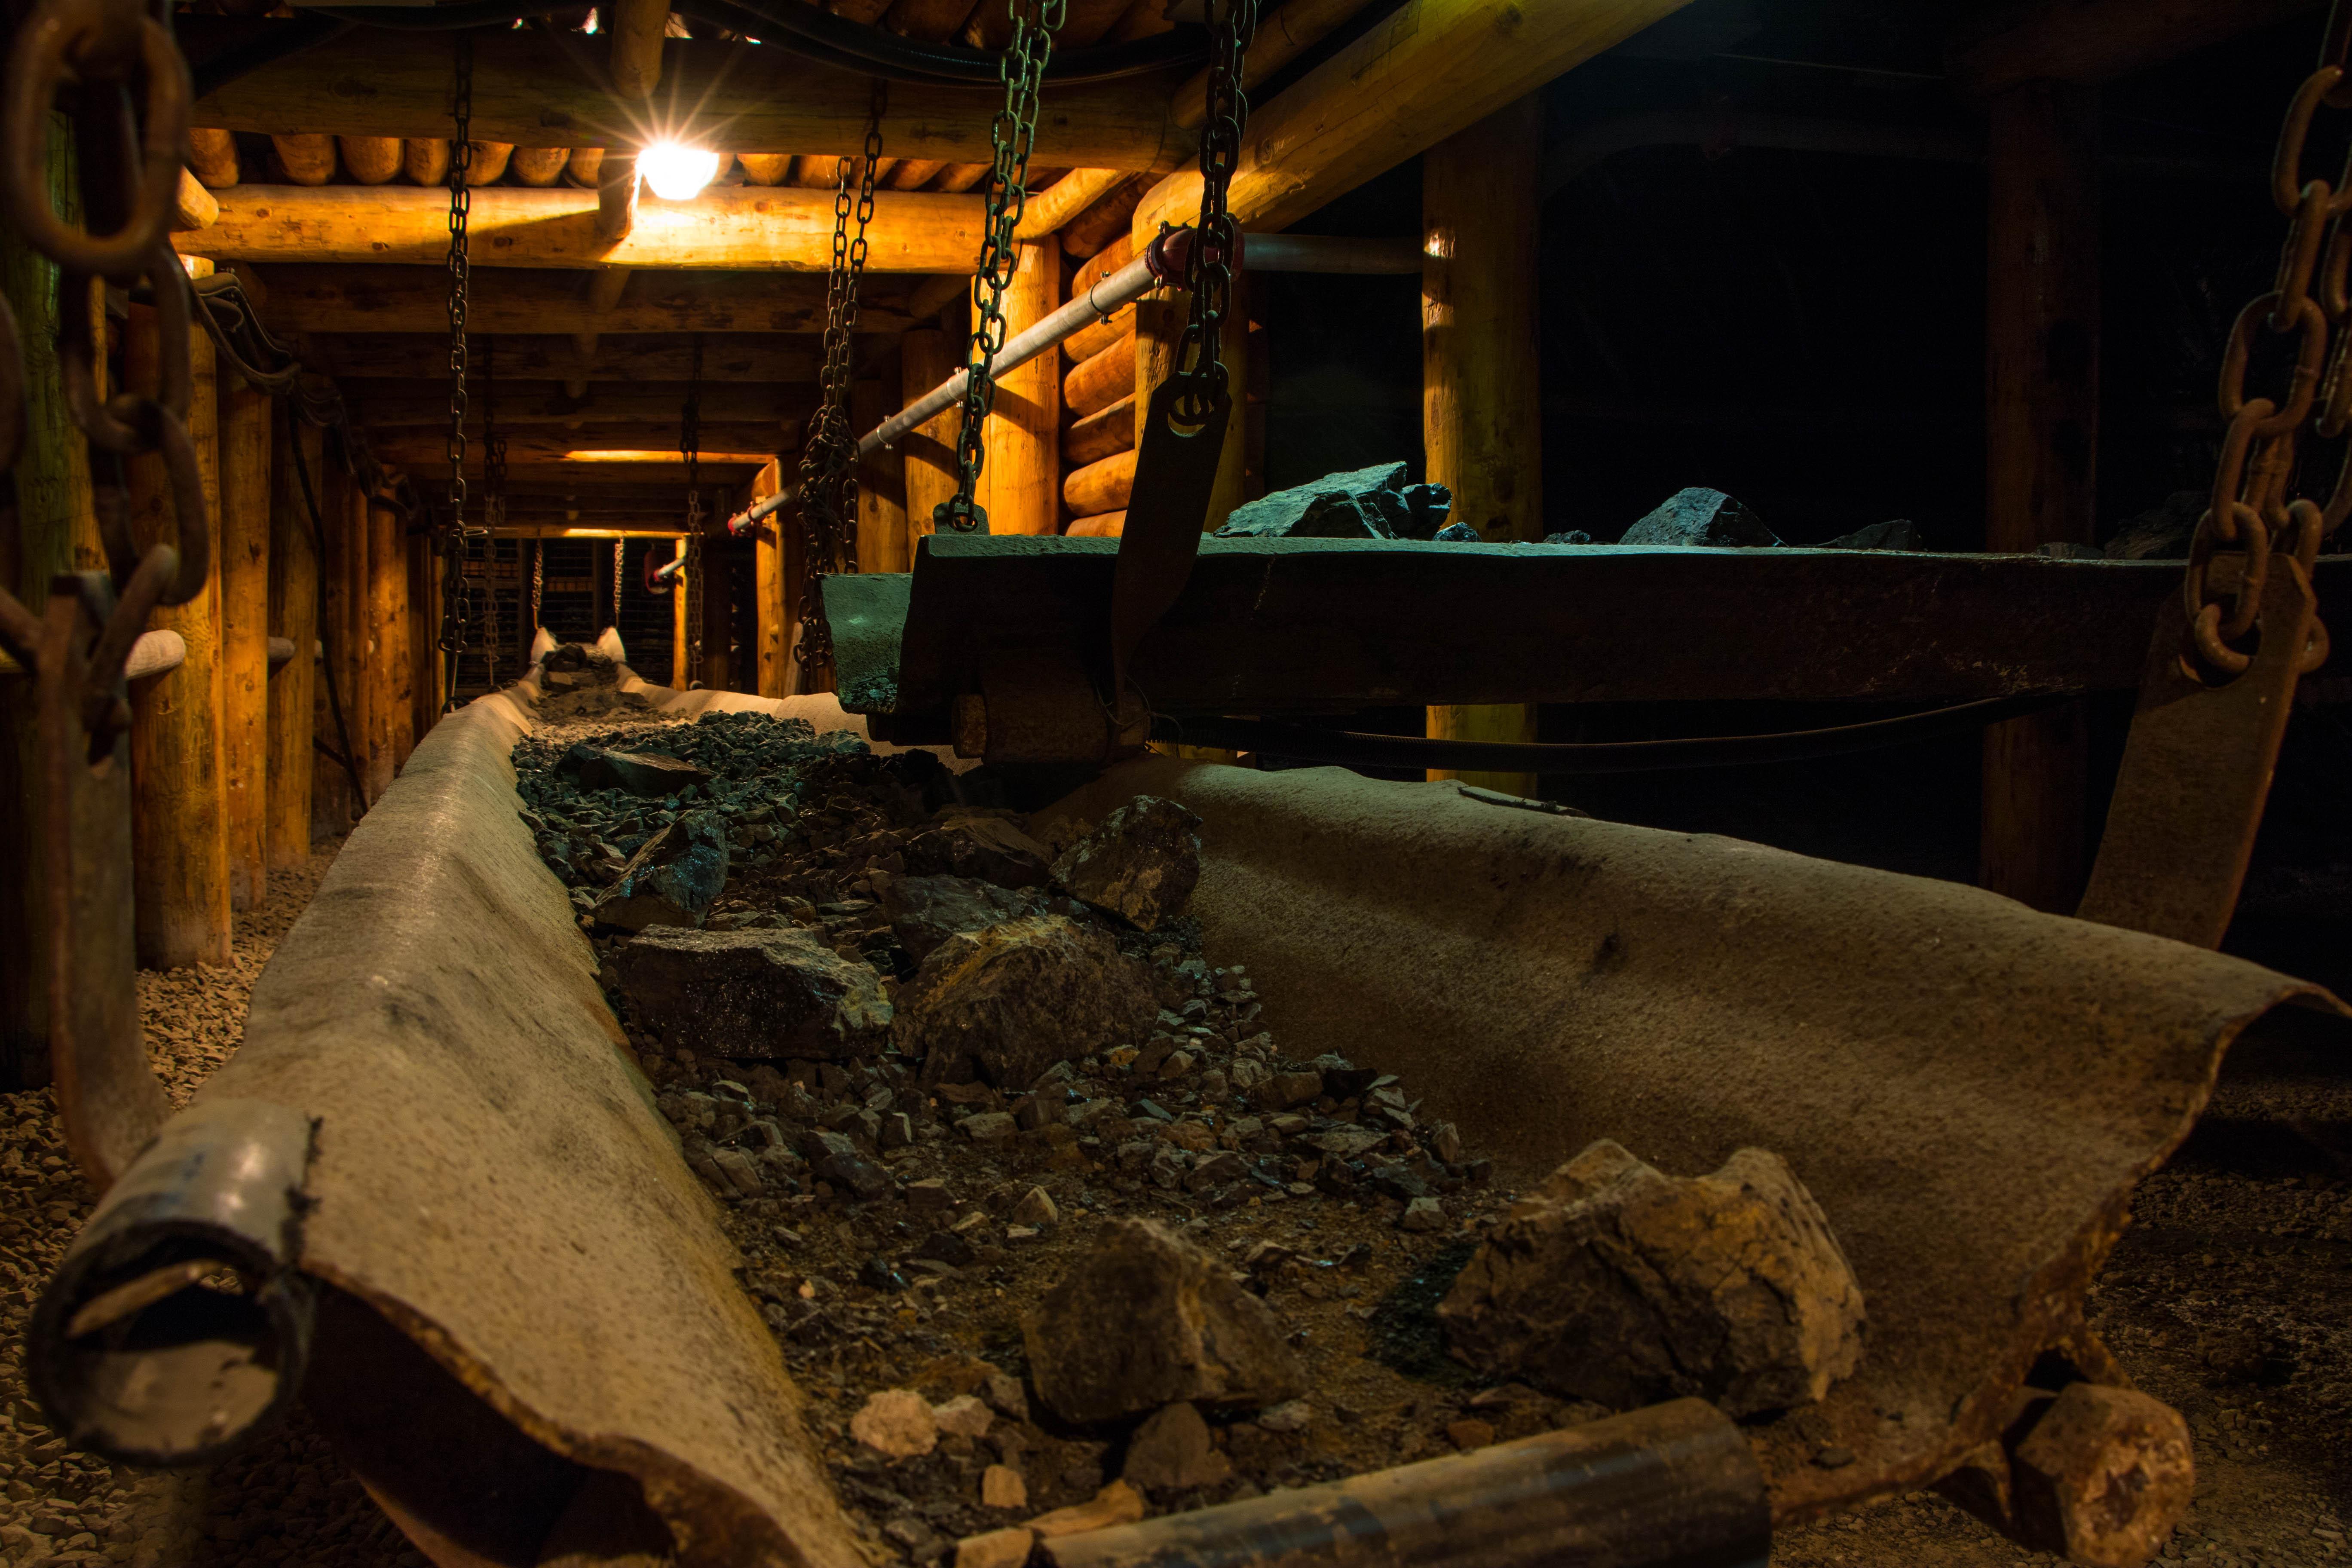 Galleria sotterranea - Museo del Carbone -Grande Miniera di Serbariu, Carbonia